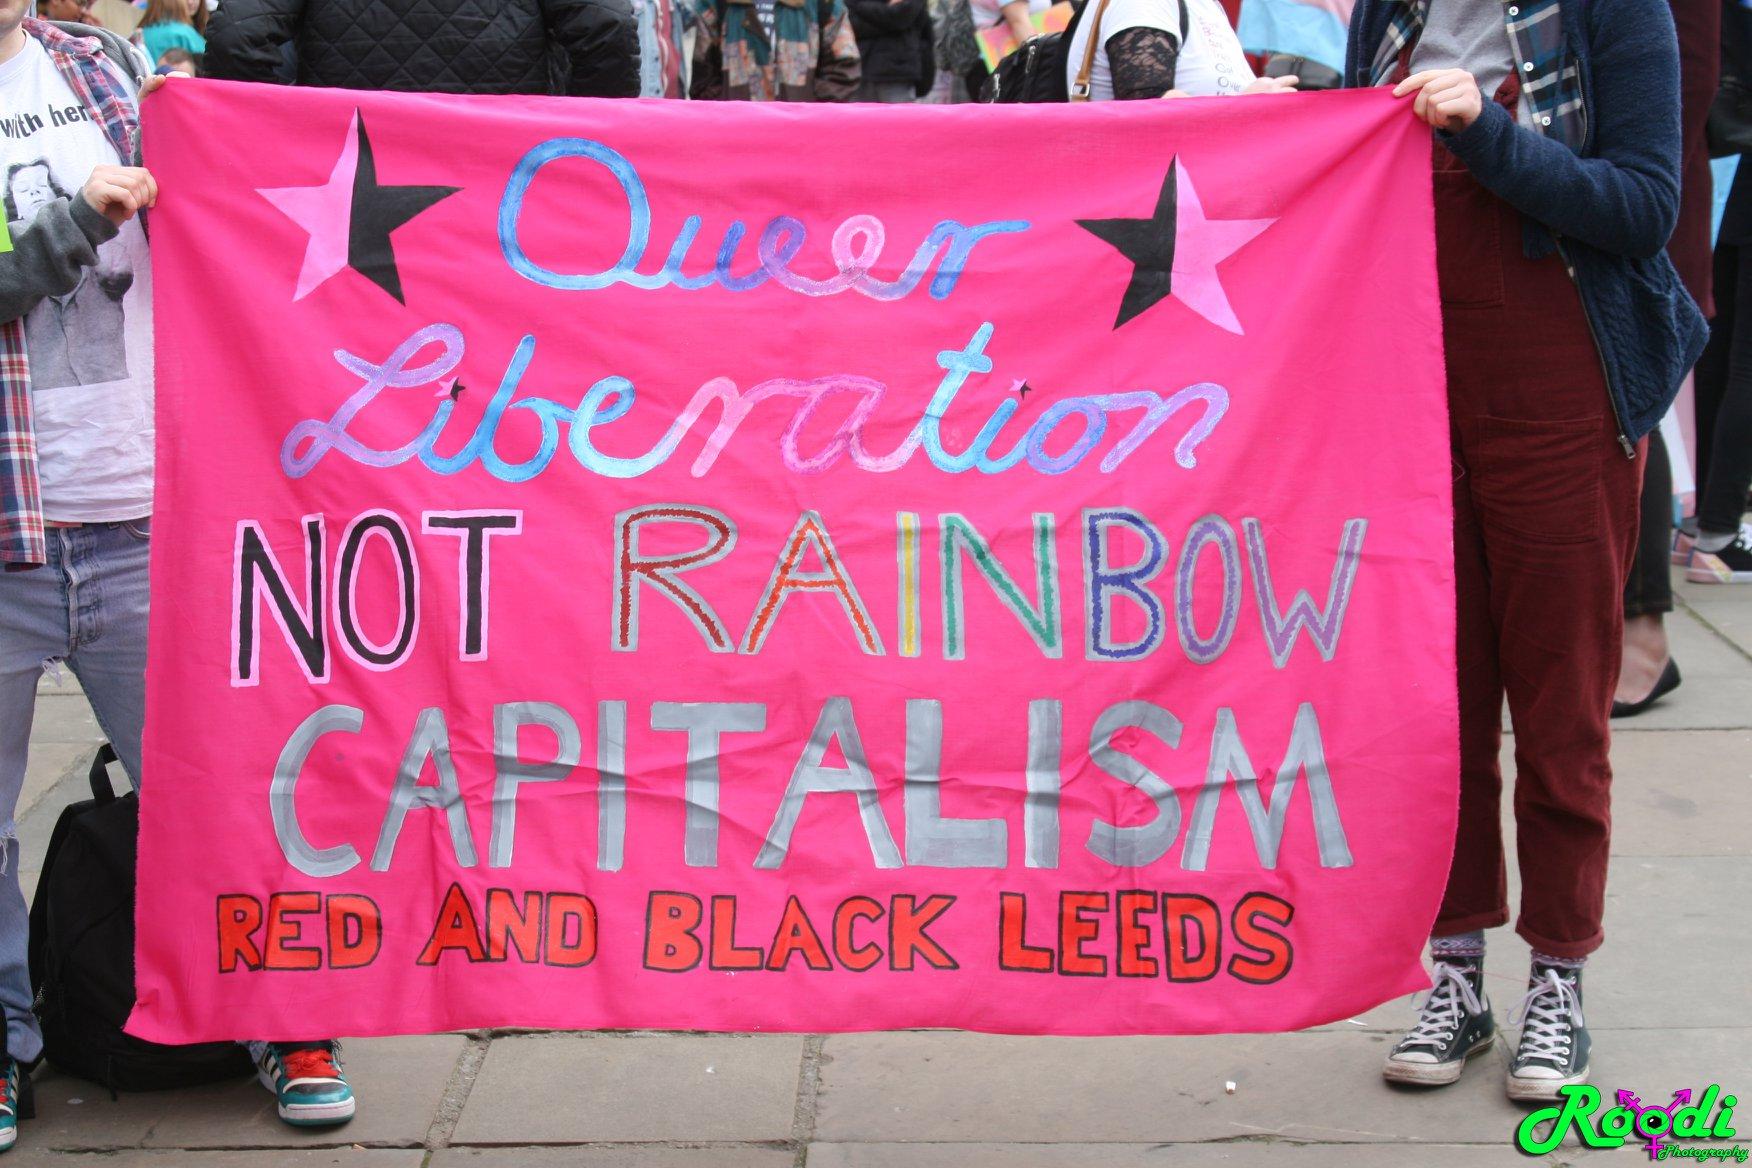 Баннер с демонстрации RABL на транс-прайде. Лидс, 2018 г. — BombshellRoodi